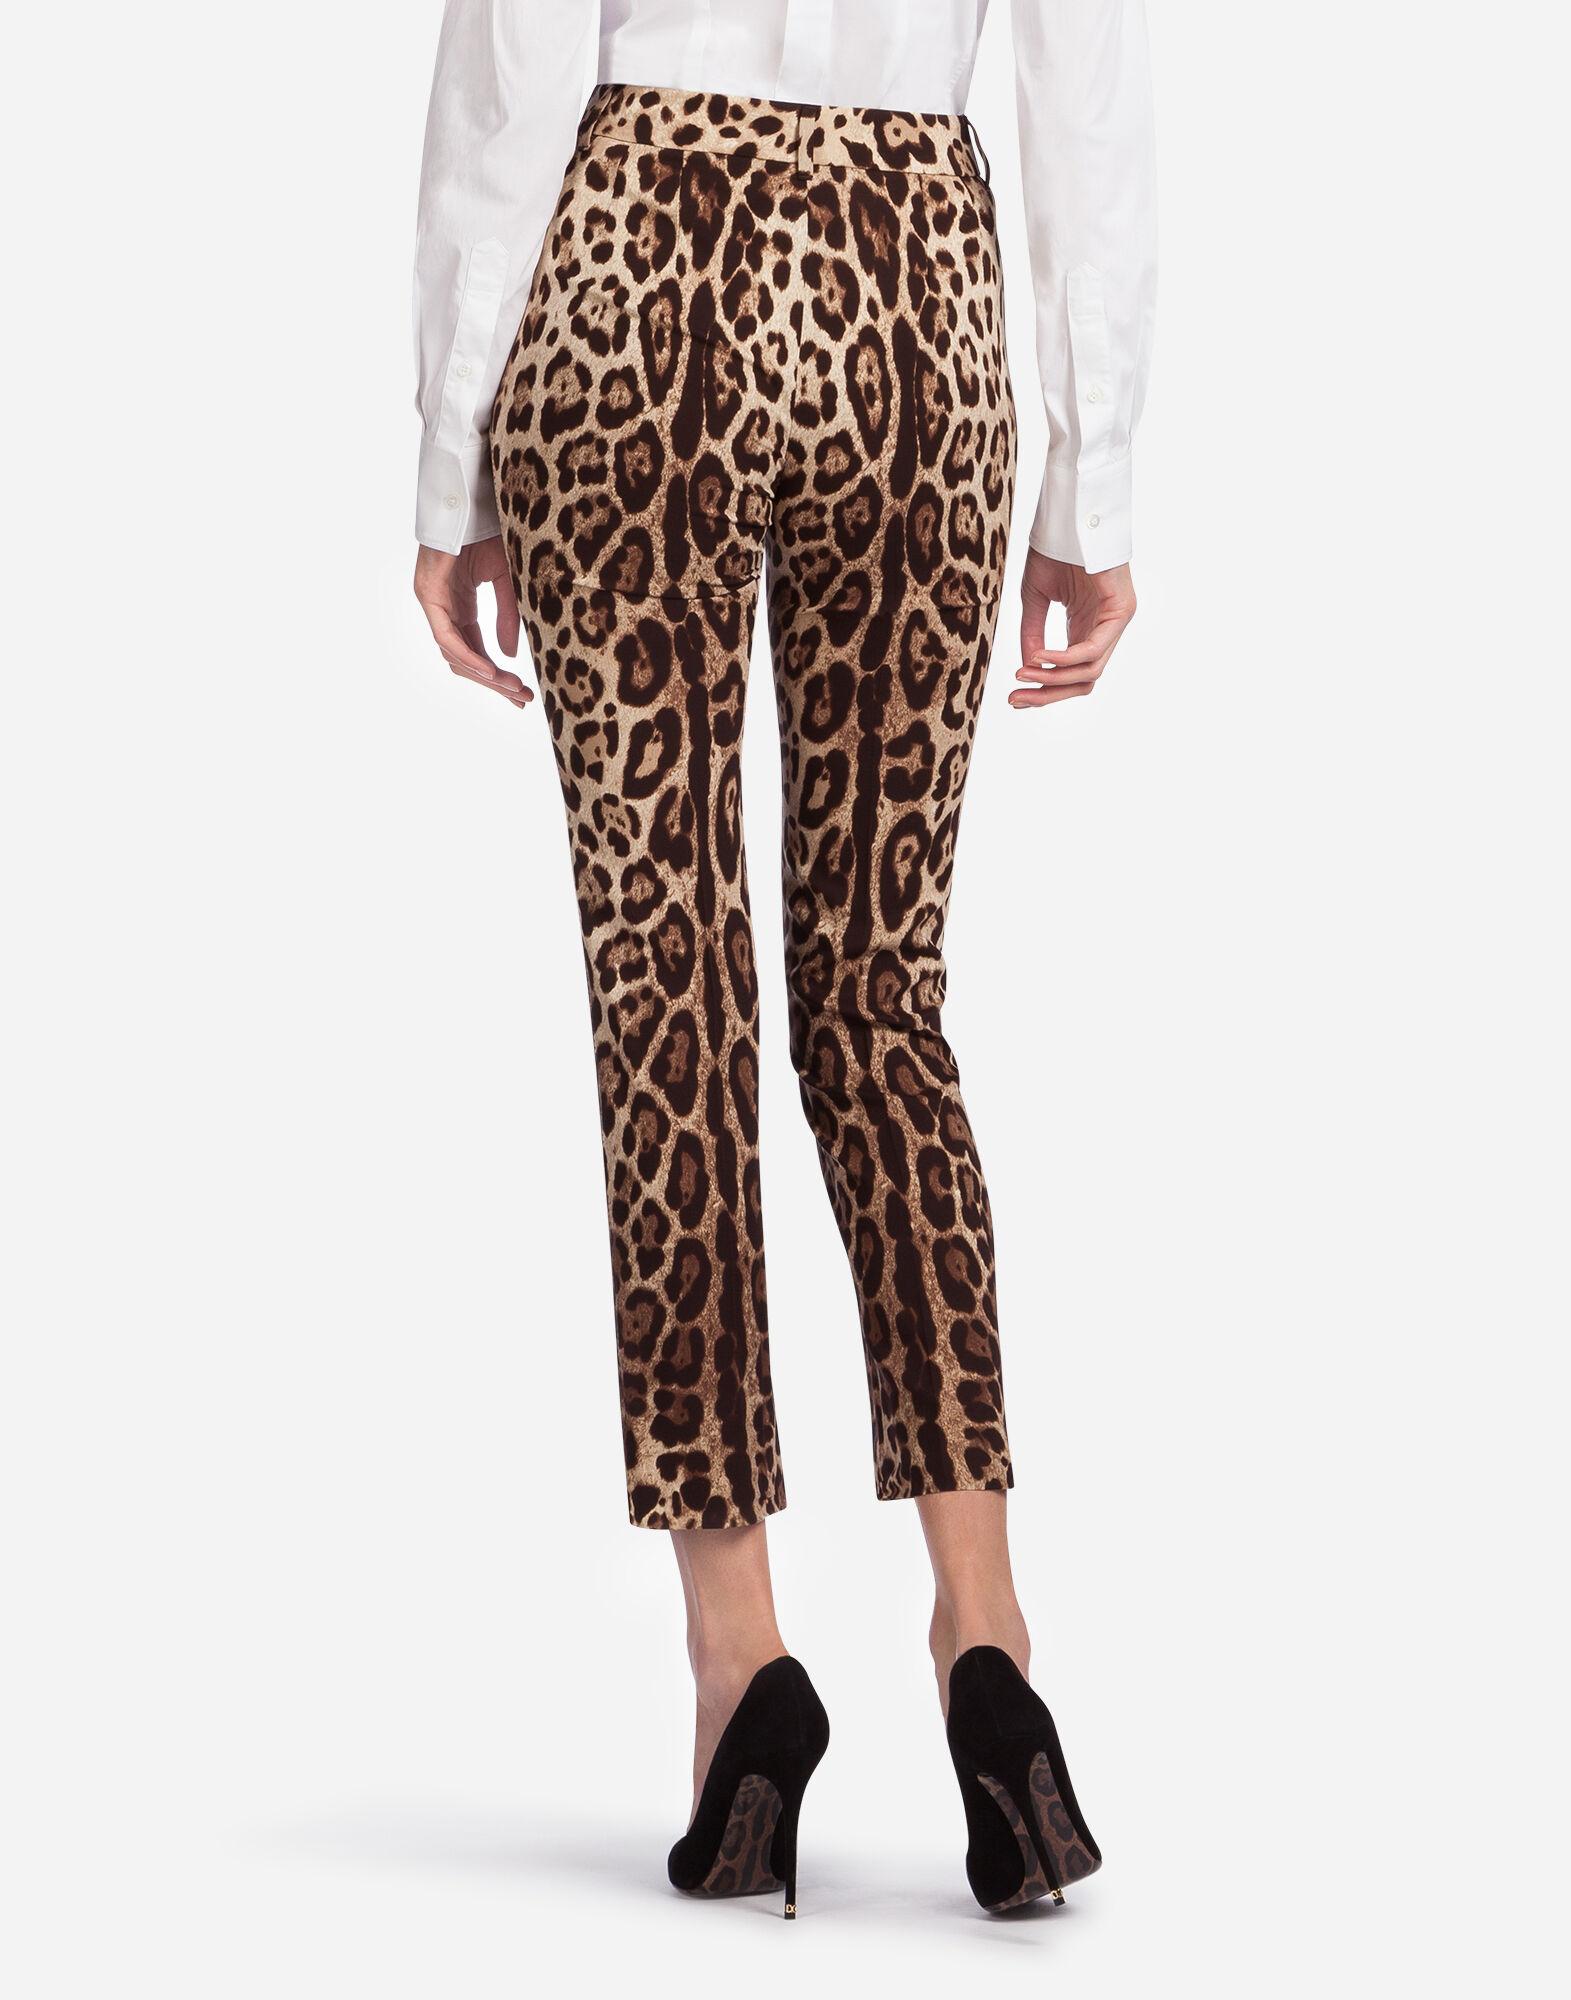 LEOPARD PRINT CADY PANTS